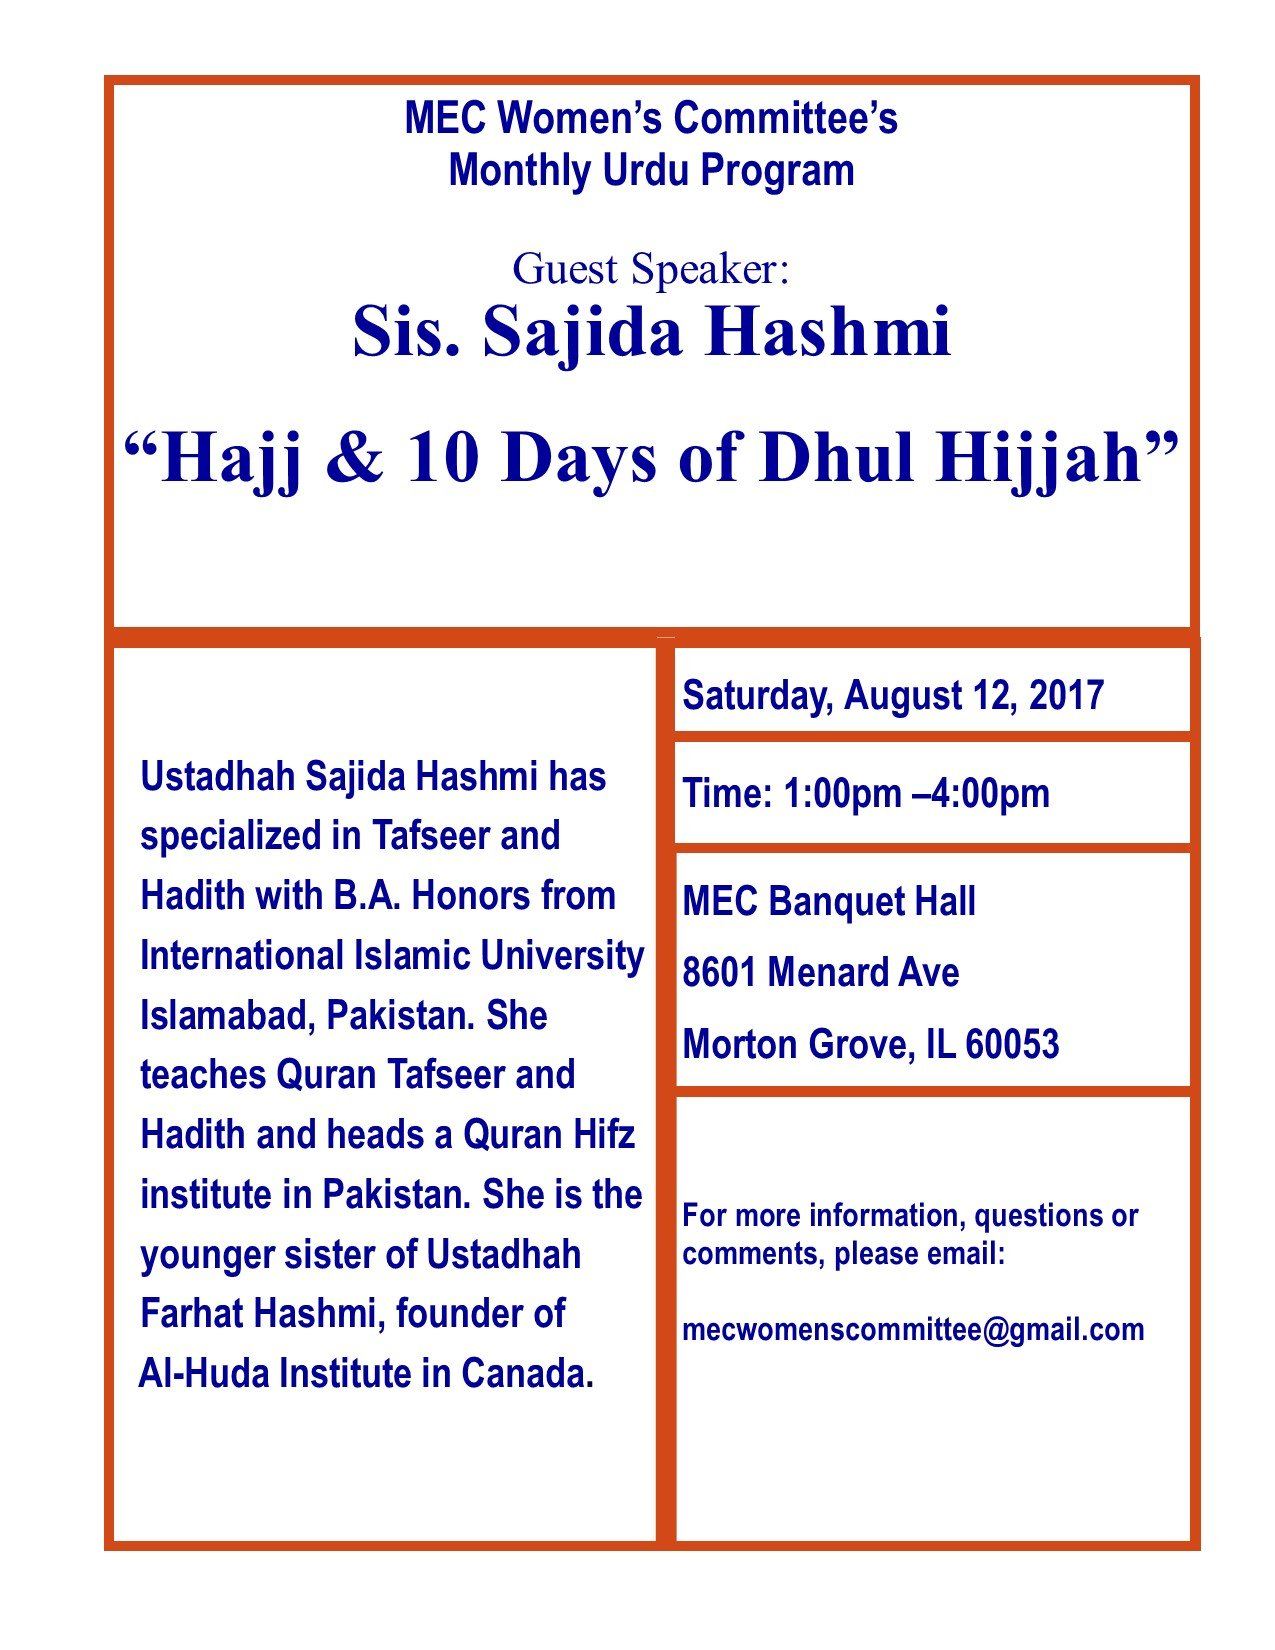 Dhul Hijja 2019 Calendrier.Hajj 10 Days Of Dhul Hijjah By Sr Sajida Hashmi On Sat